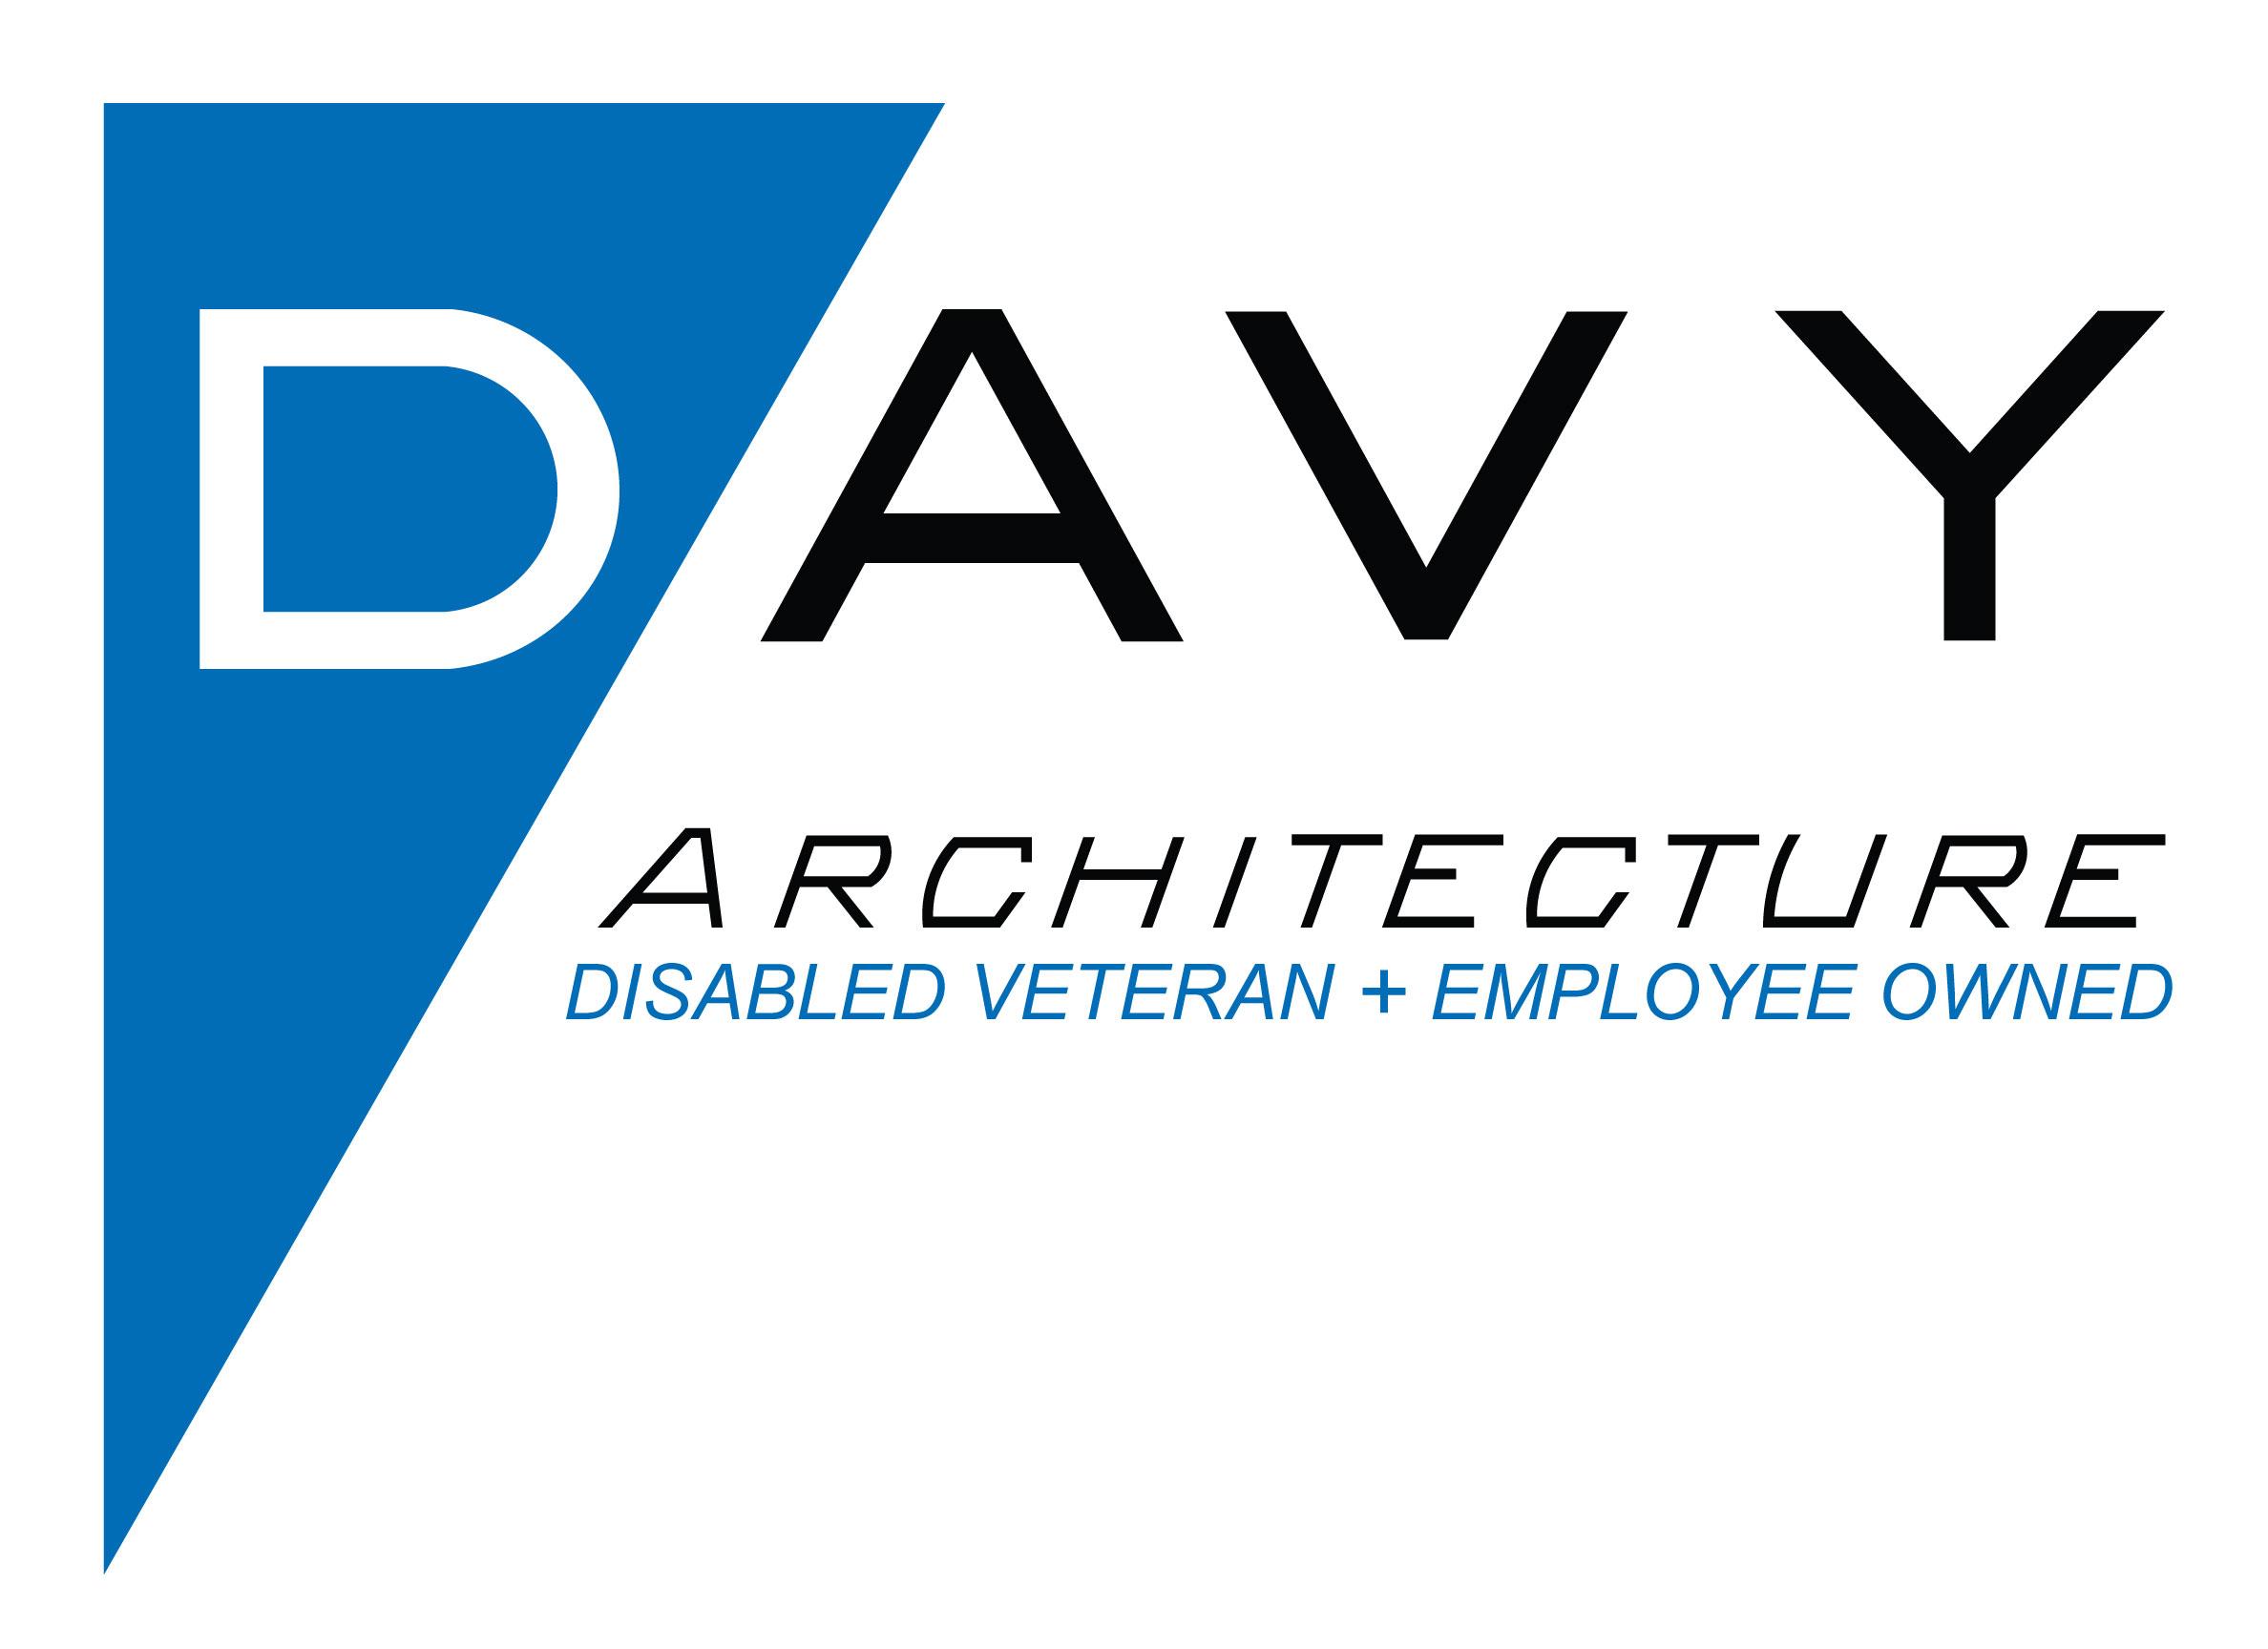 davy_logo_DisabledVeteran+EmployeeOwned.jpg